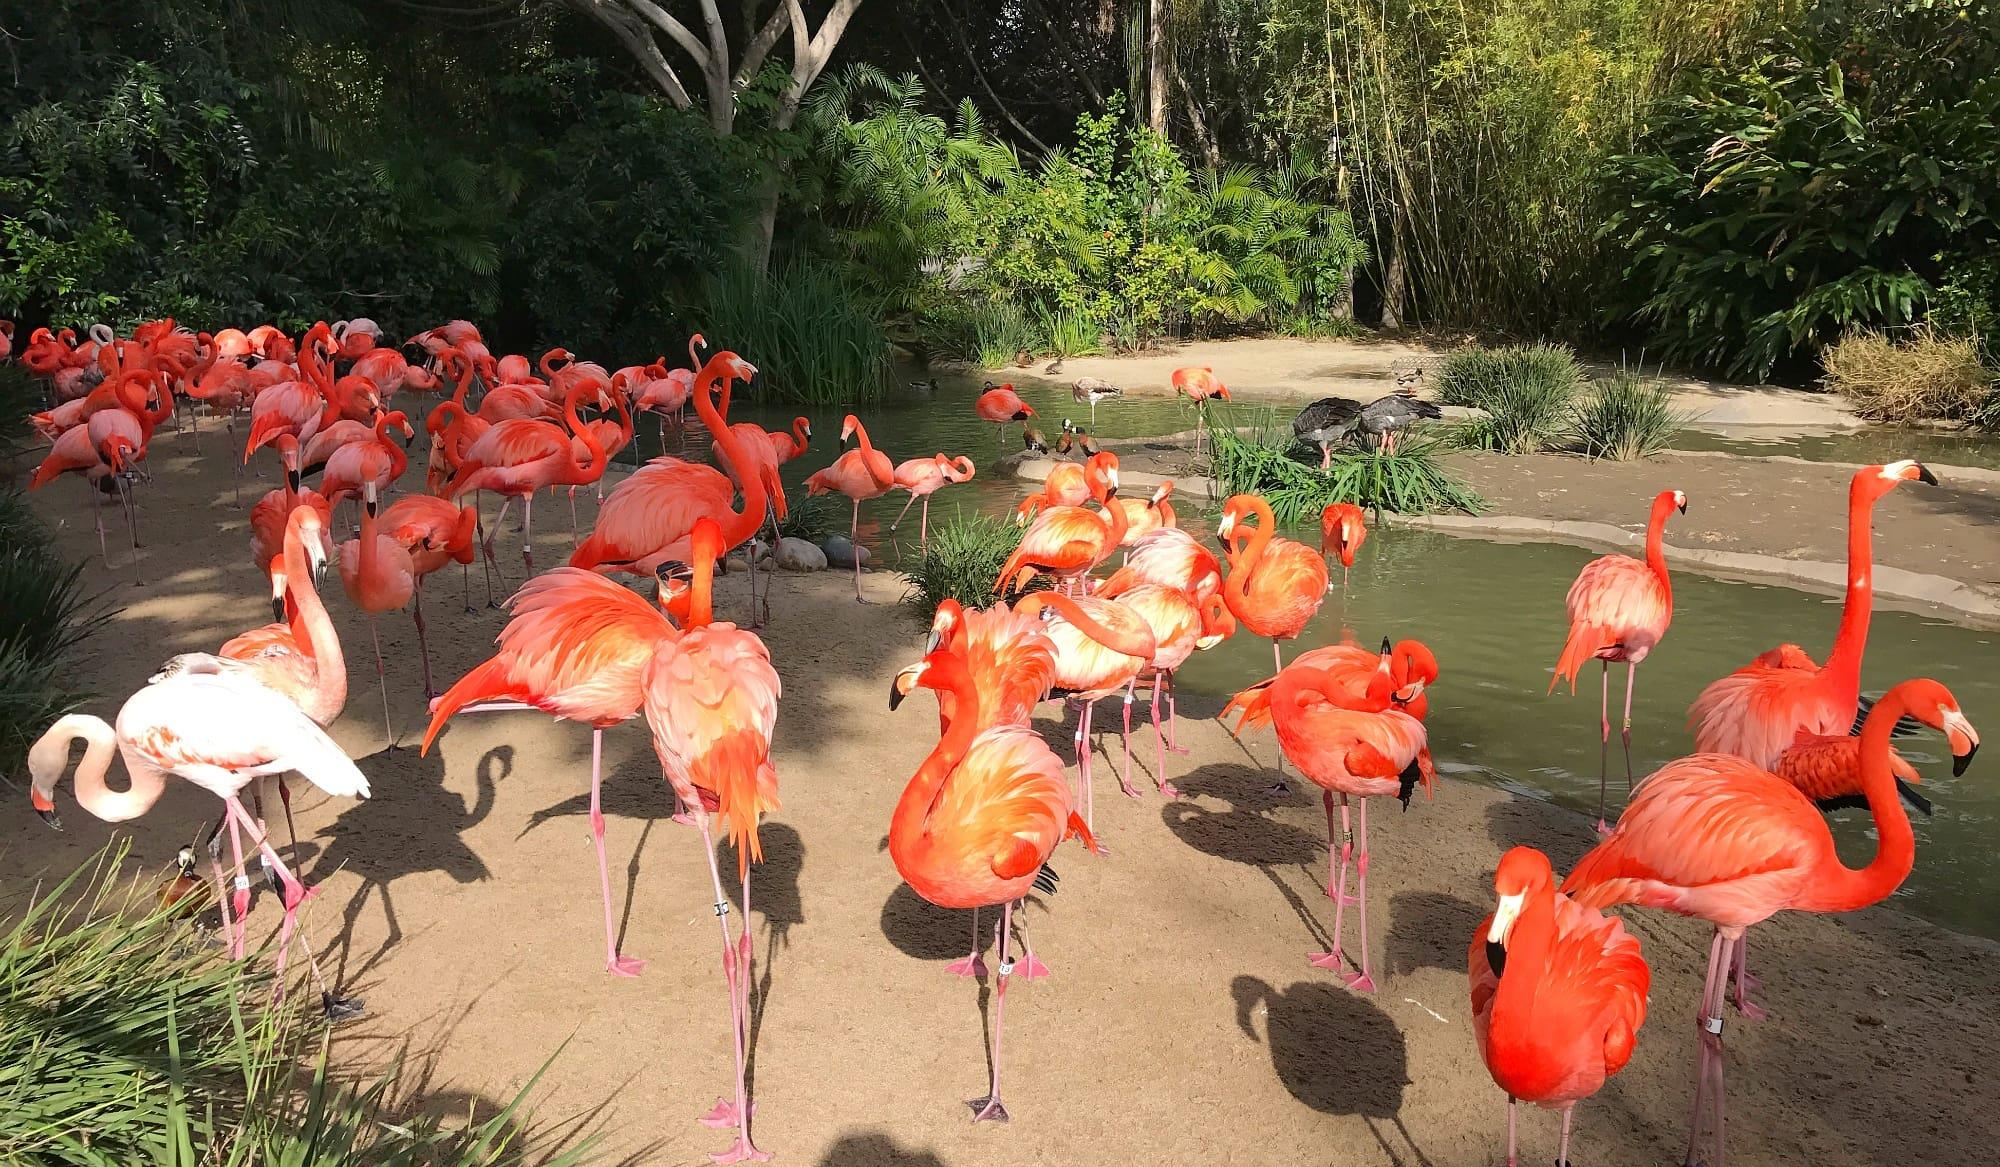 Kids love the flamingo exhibit near San Diego Zoo's entrance